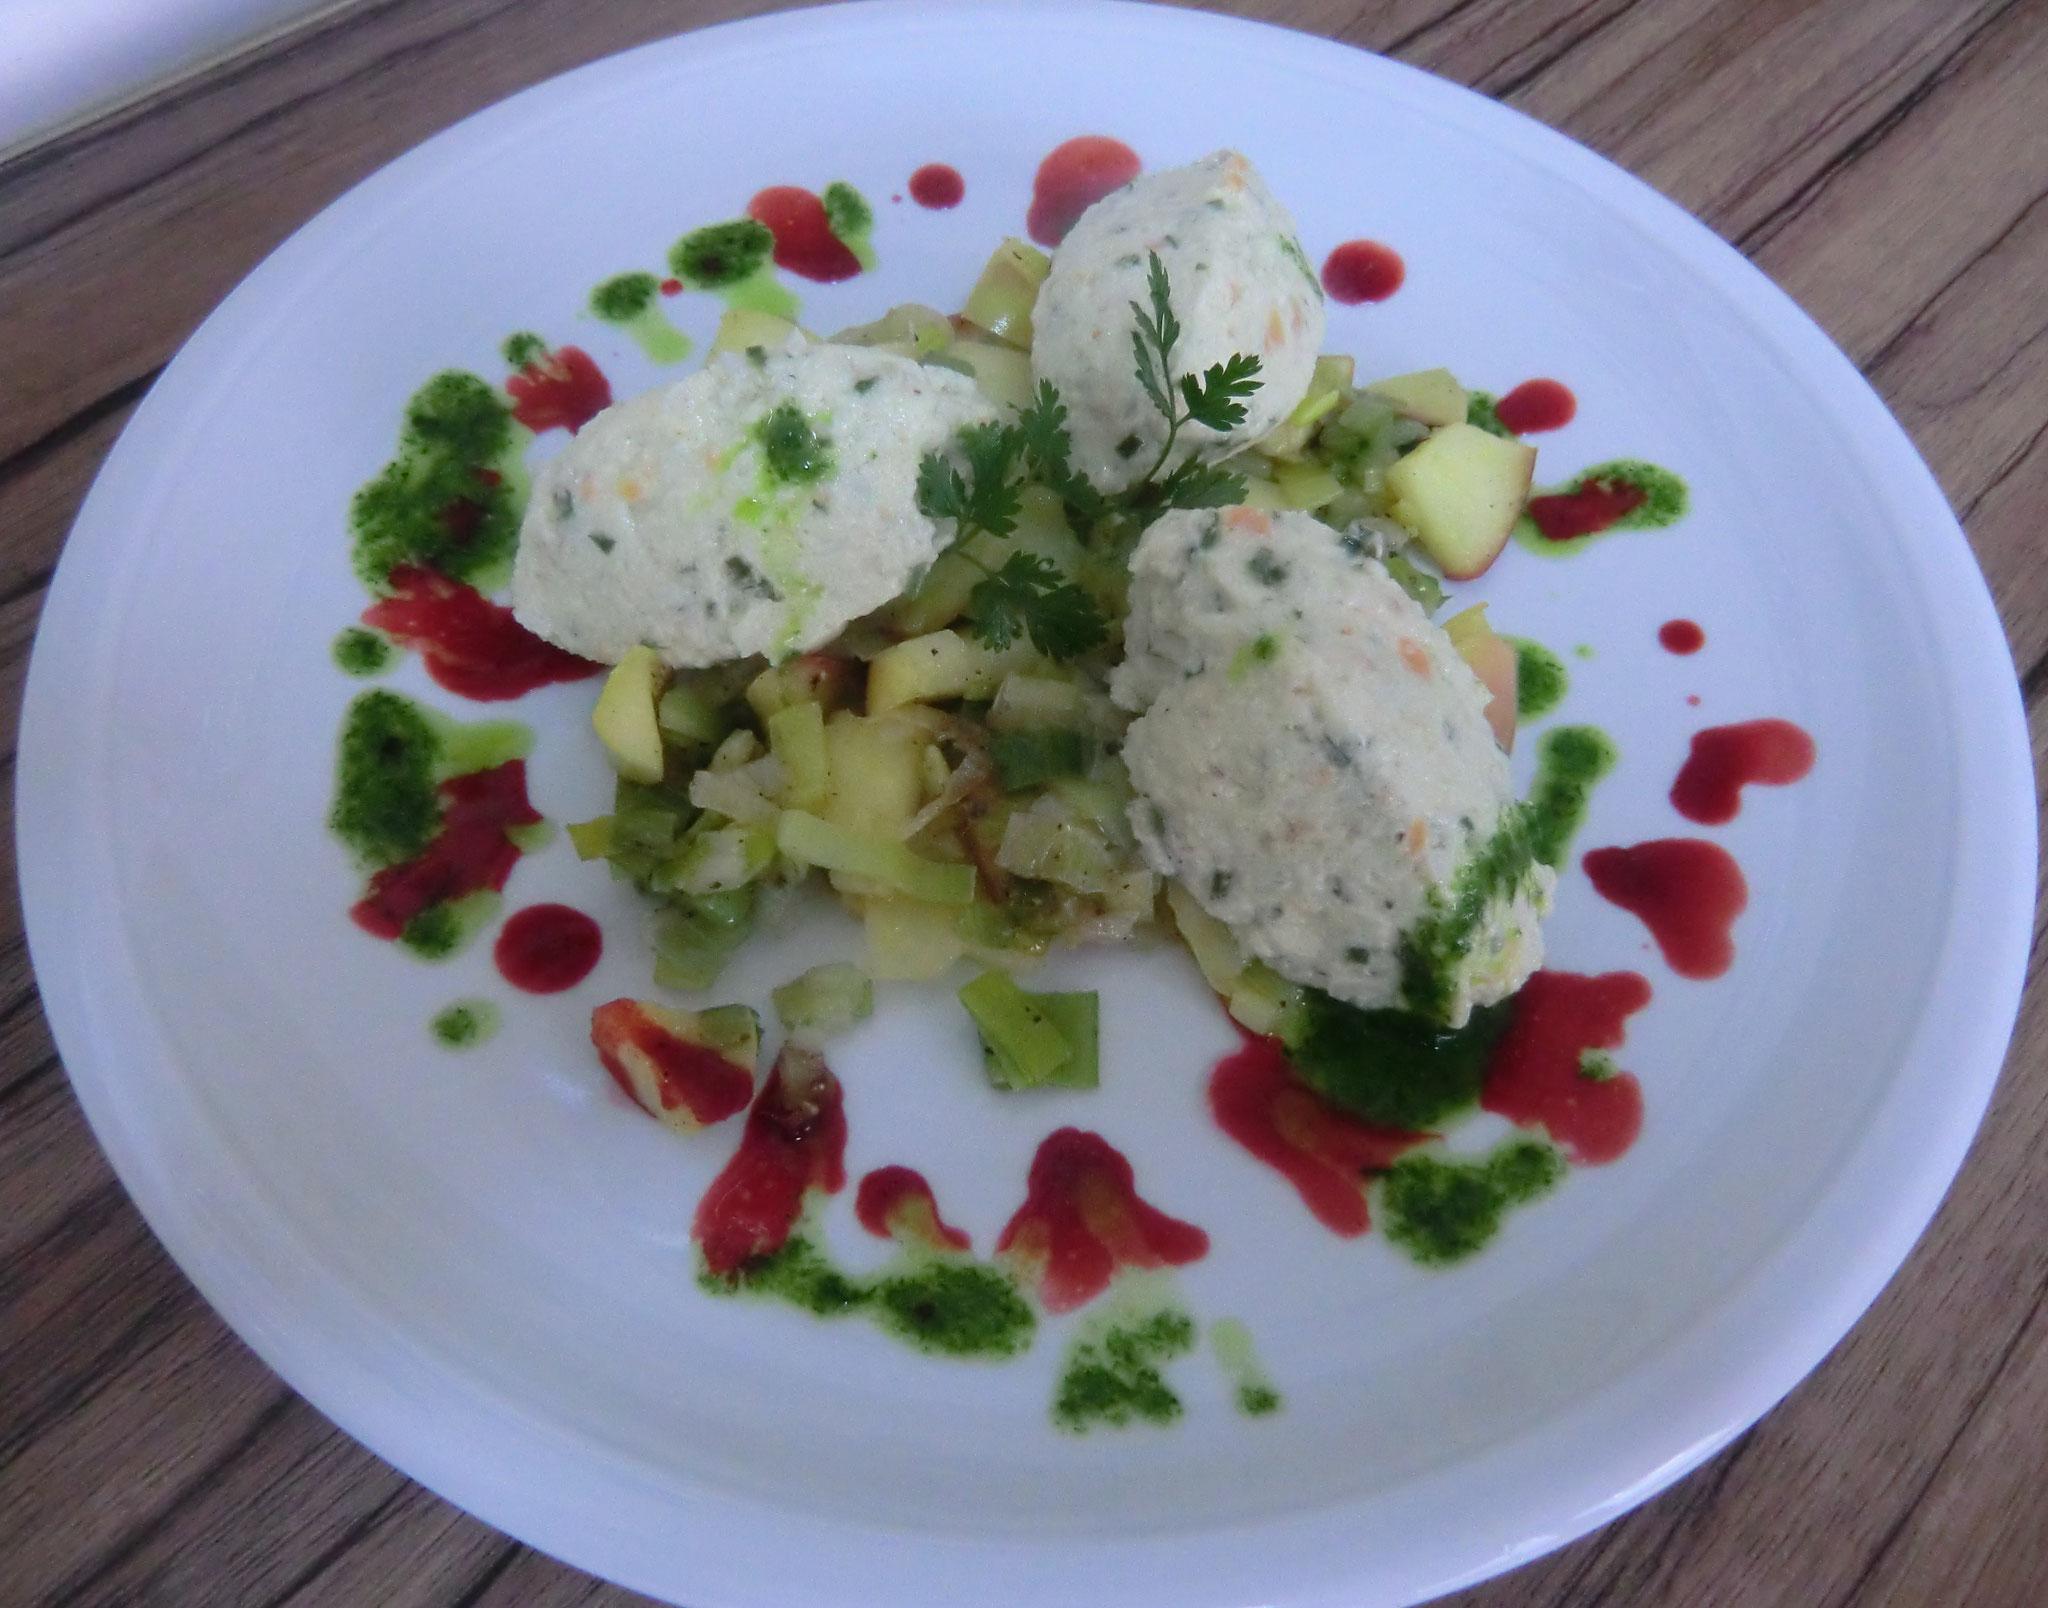 Kräuter-Grießnocken - Apfel-Lauch-Gemüse